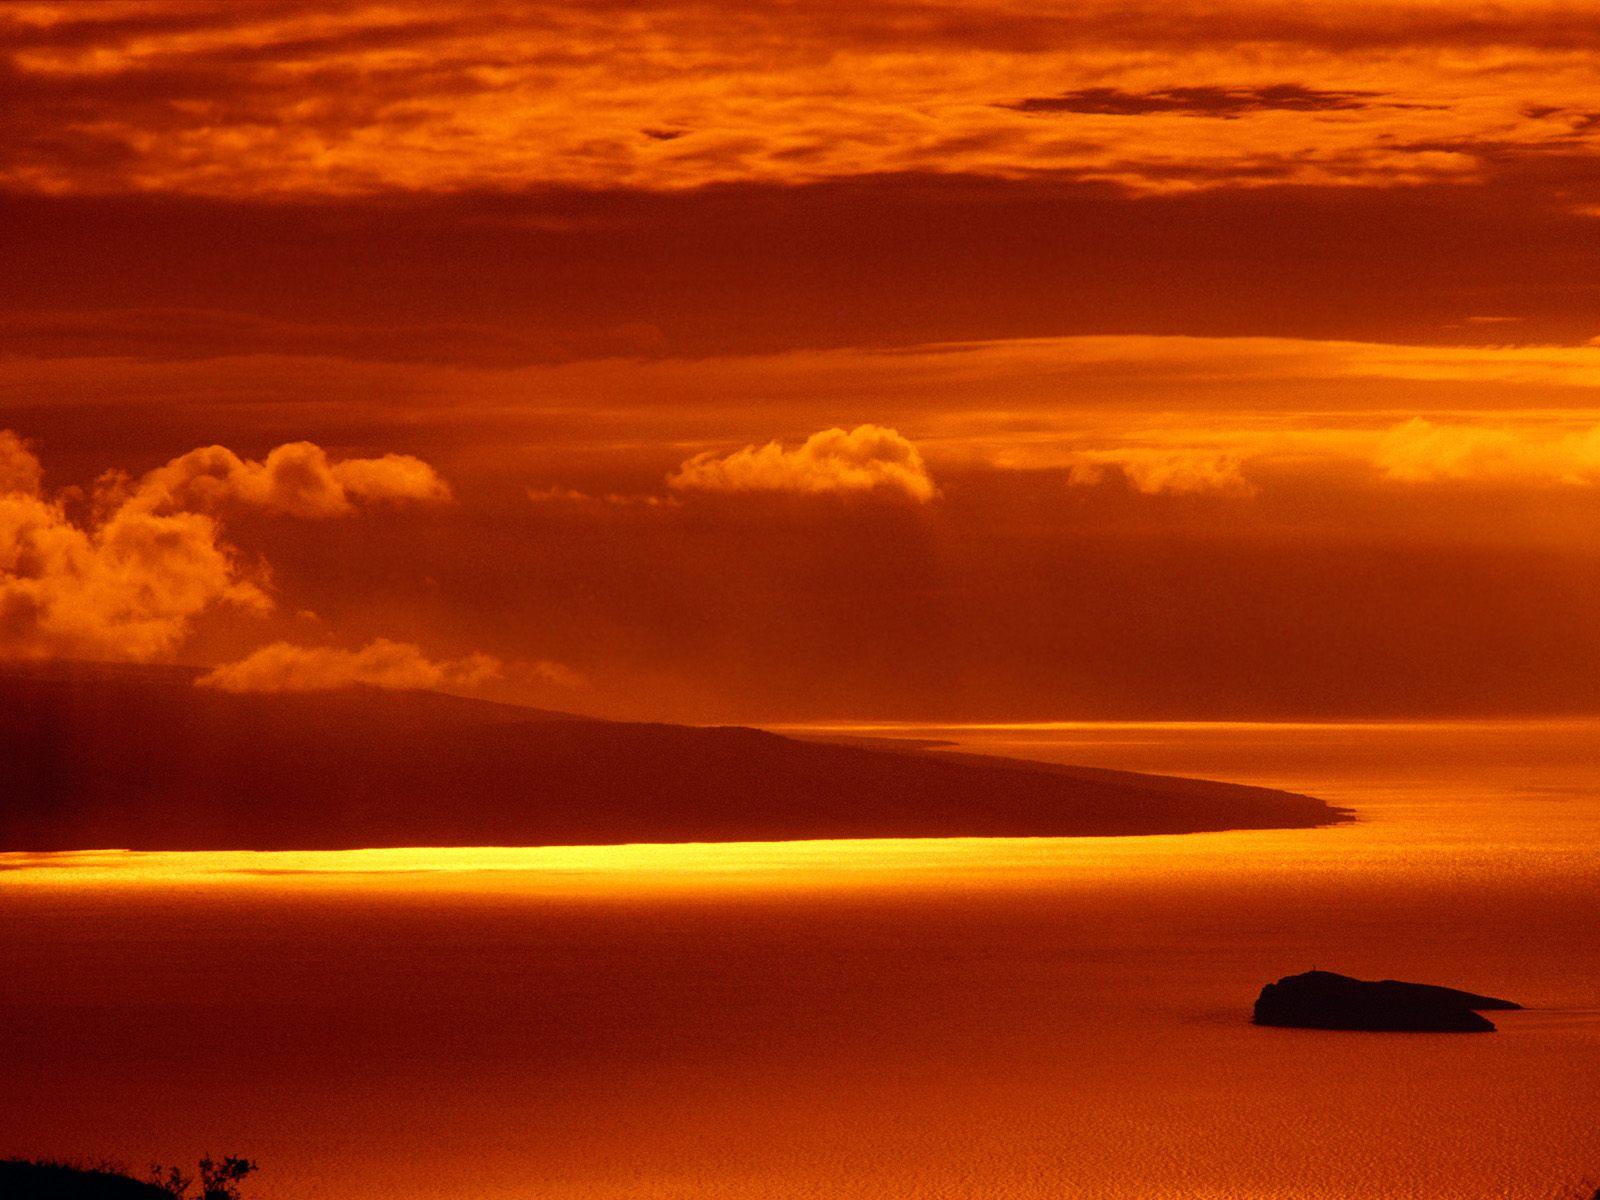 TOP WALLPAPER: Sunrise/Sunset